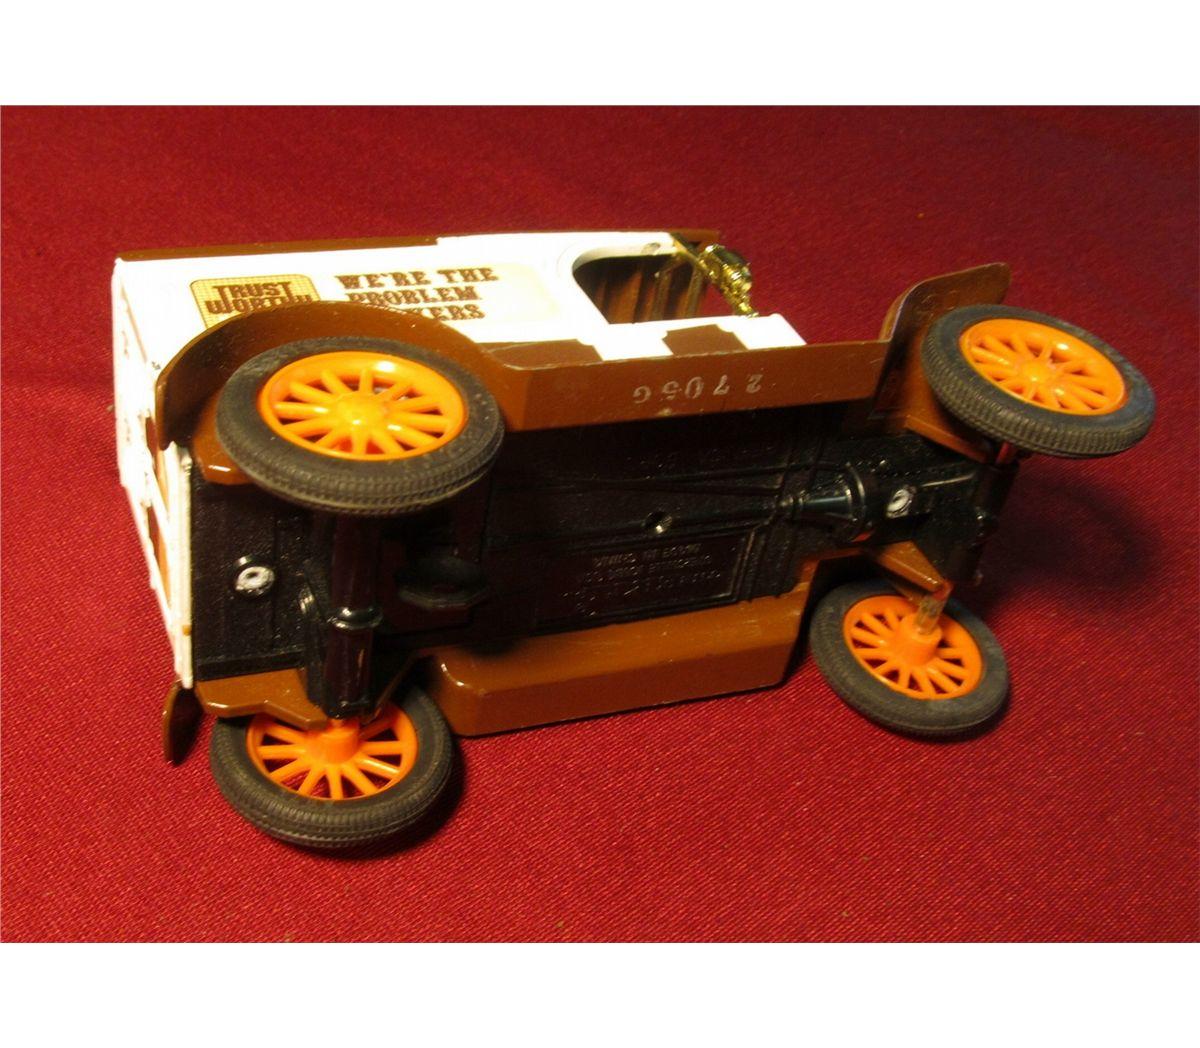 1370  Replica Ford 1817 Model T Van  Ertl Co , Dyersville, Iowa made in  China